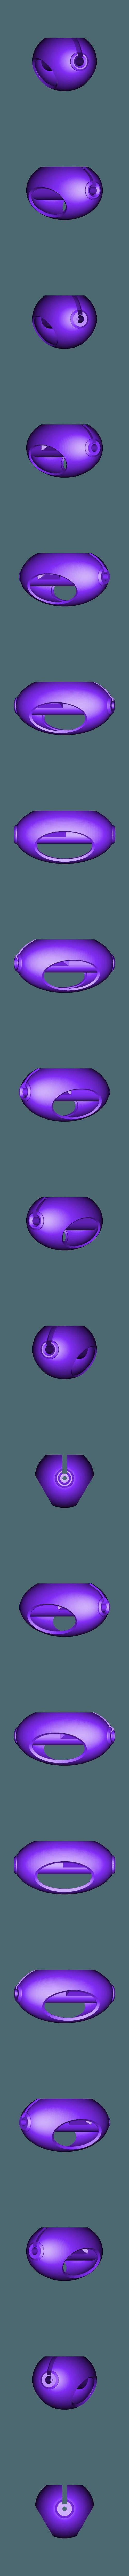 drain_camera_Exploration_pod.stl Download free STL file Drain camera exploration pod • 3D print object, Sagittario